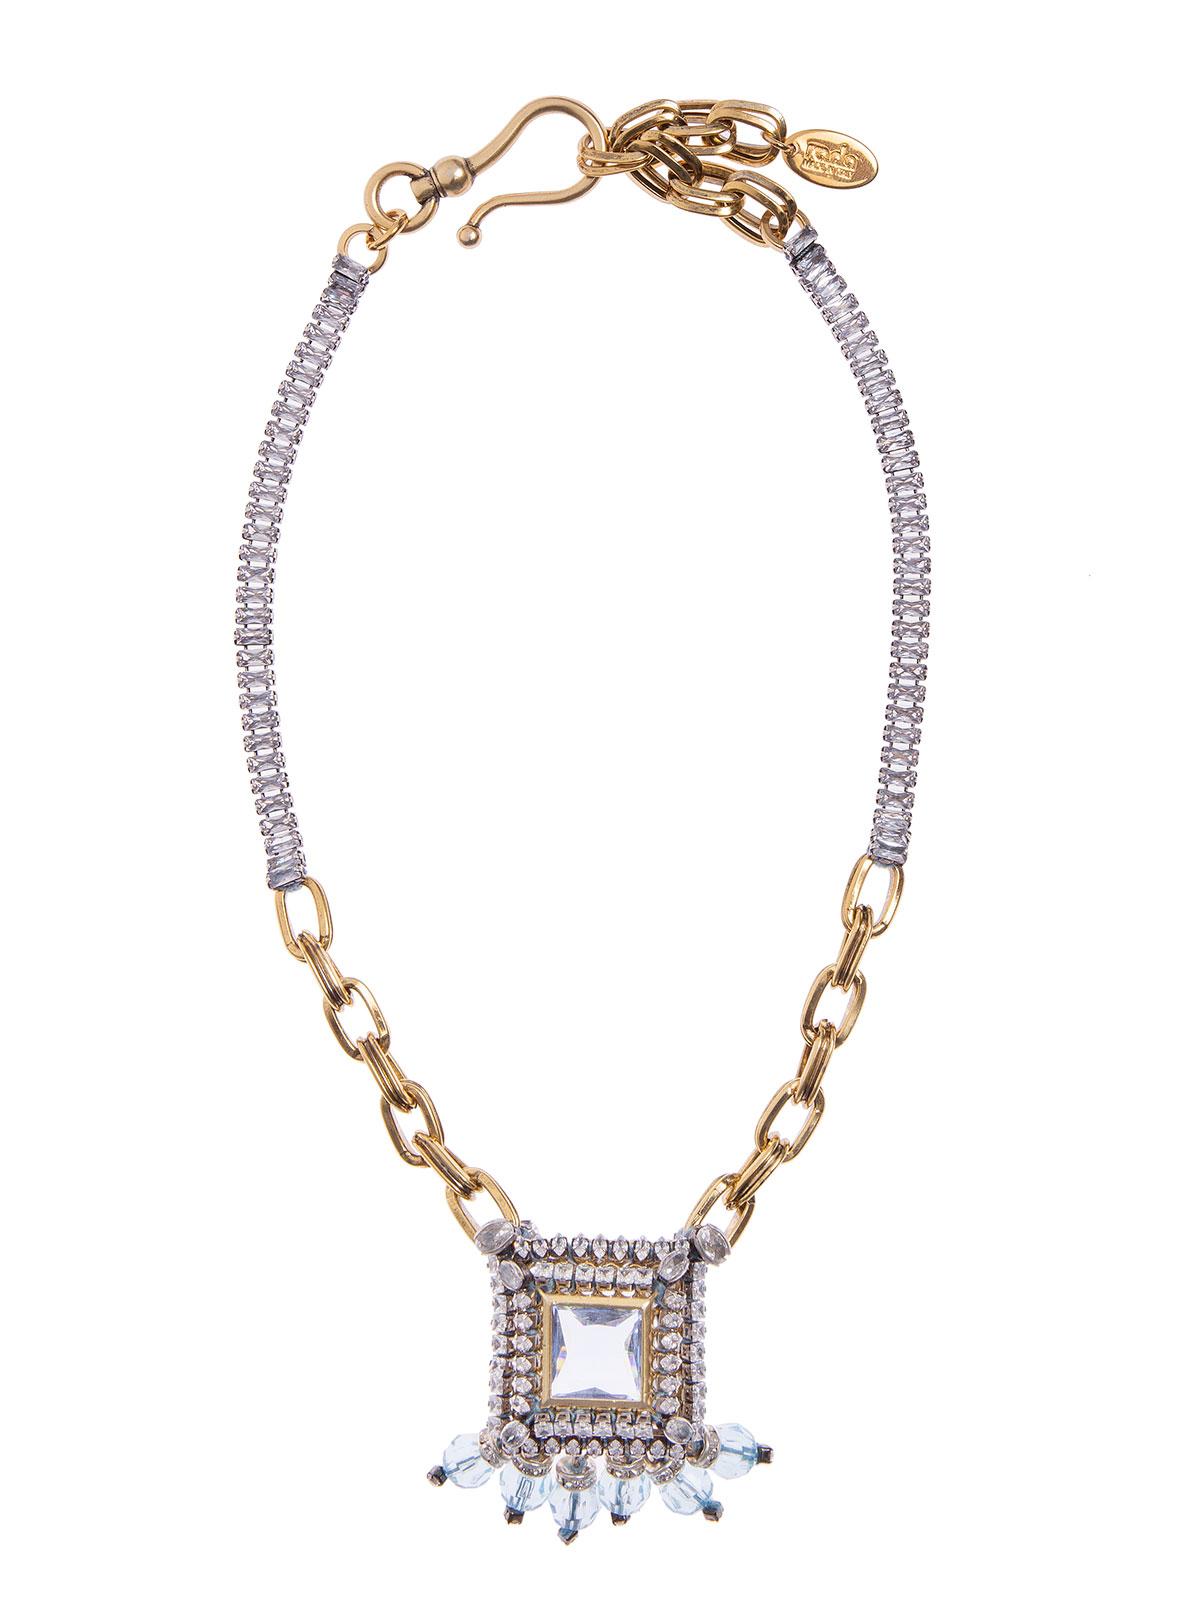 Necklace with jewel charm and plexiglass  beads